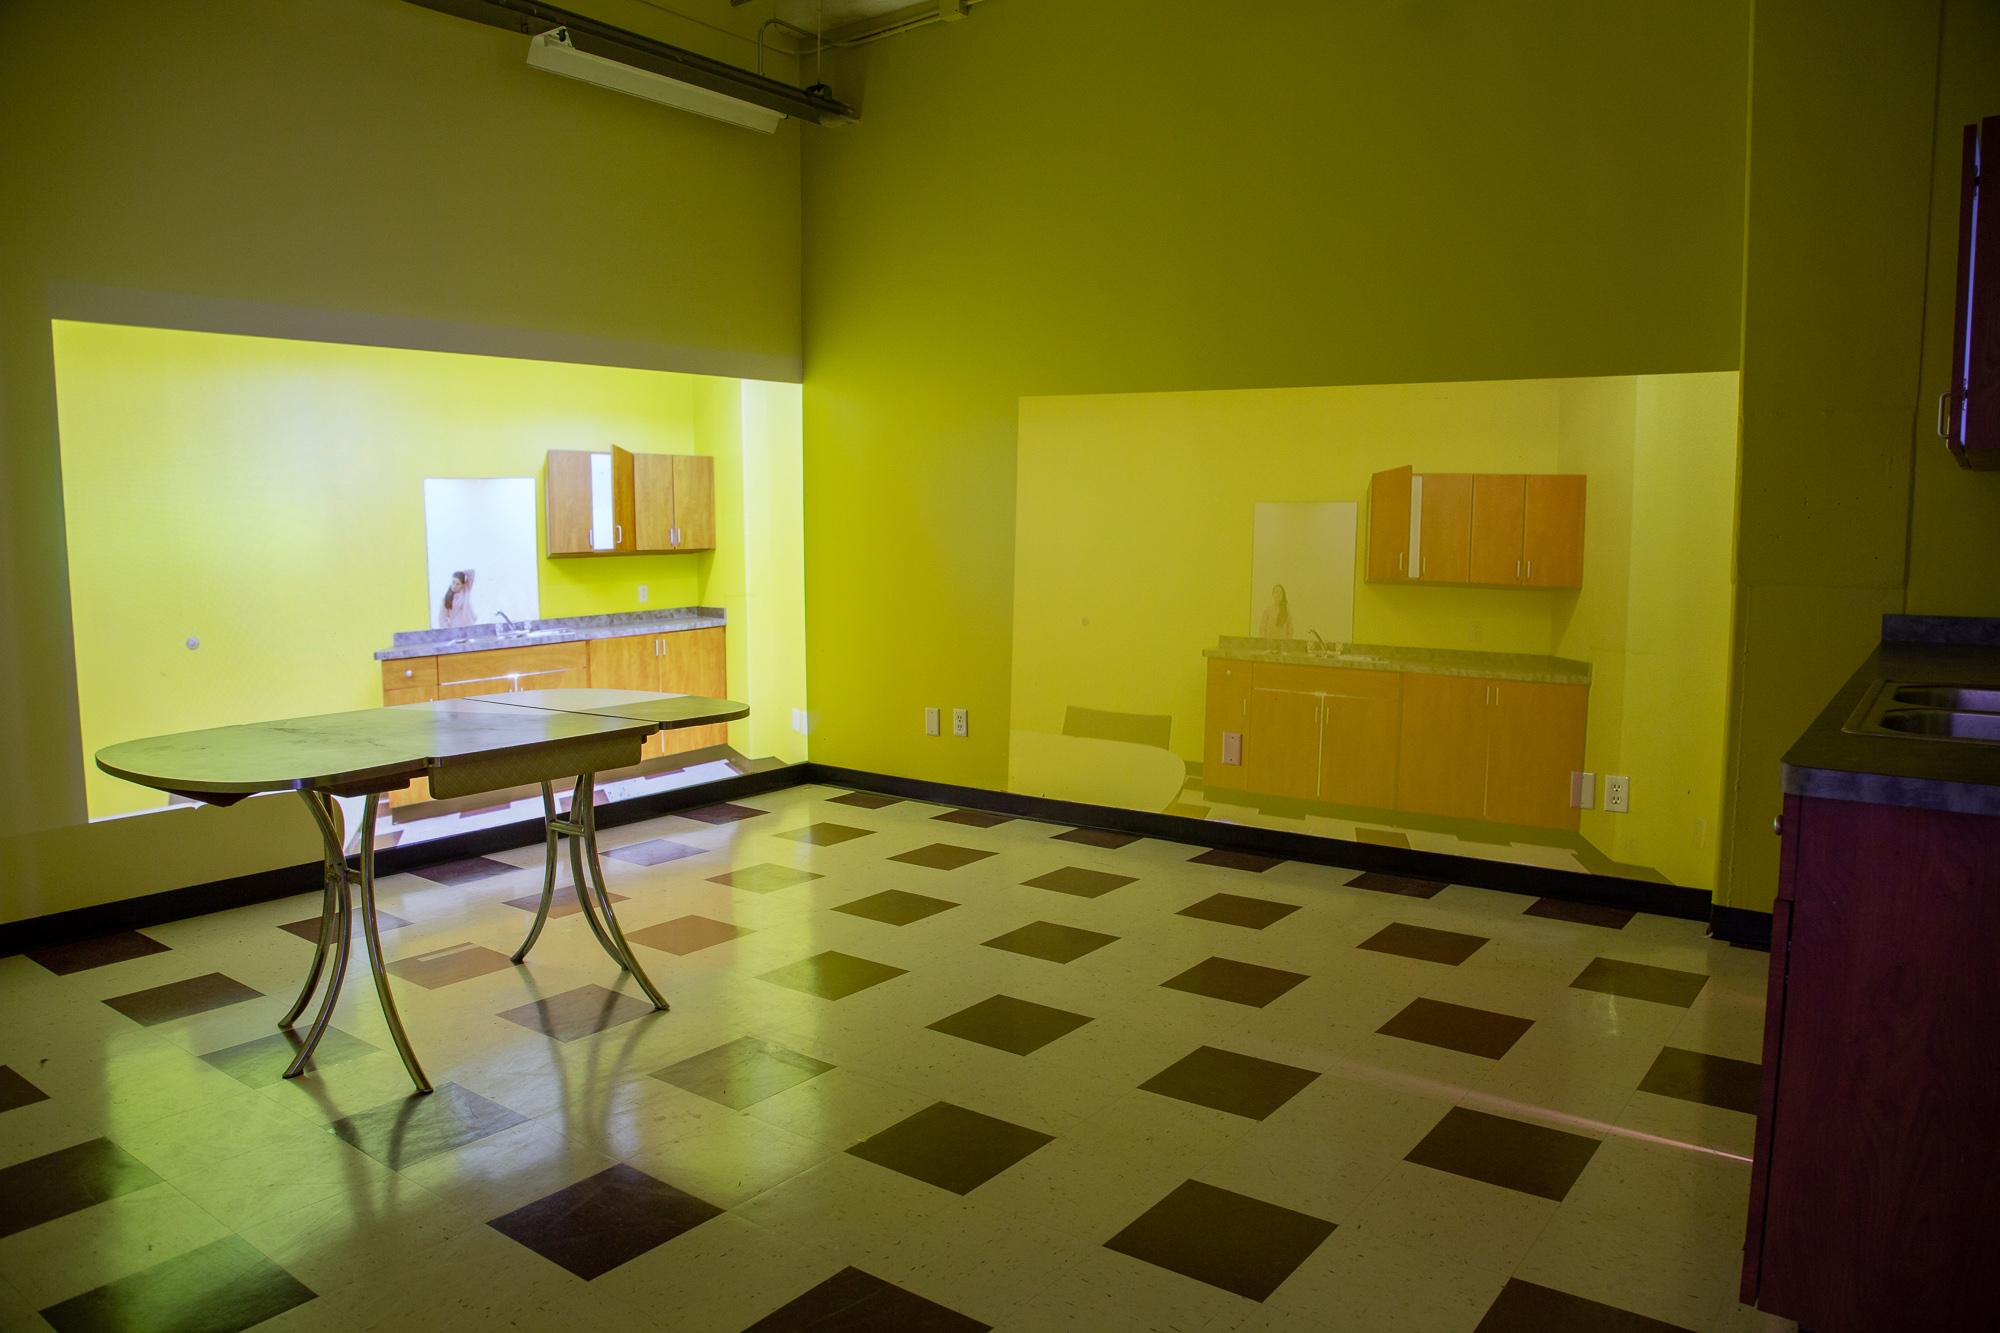 Alexandres_Delirium-Situ_Gilman_Yellow_Installation-IMG_6238.jpg